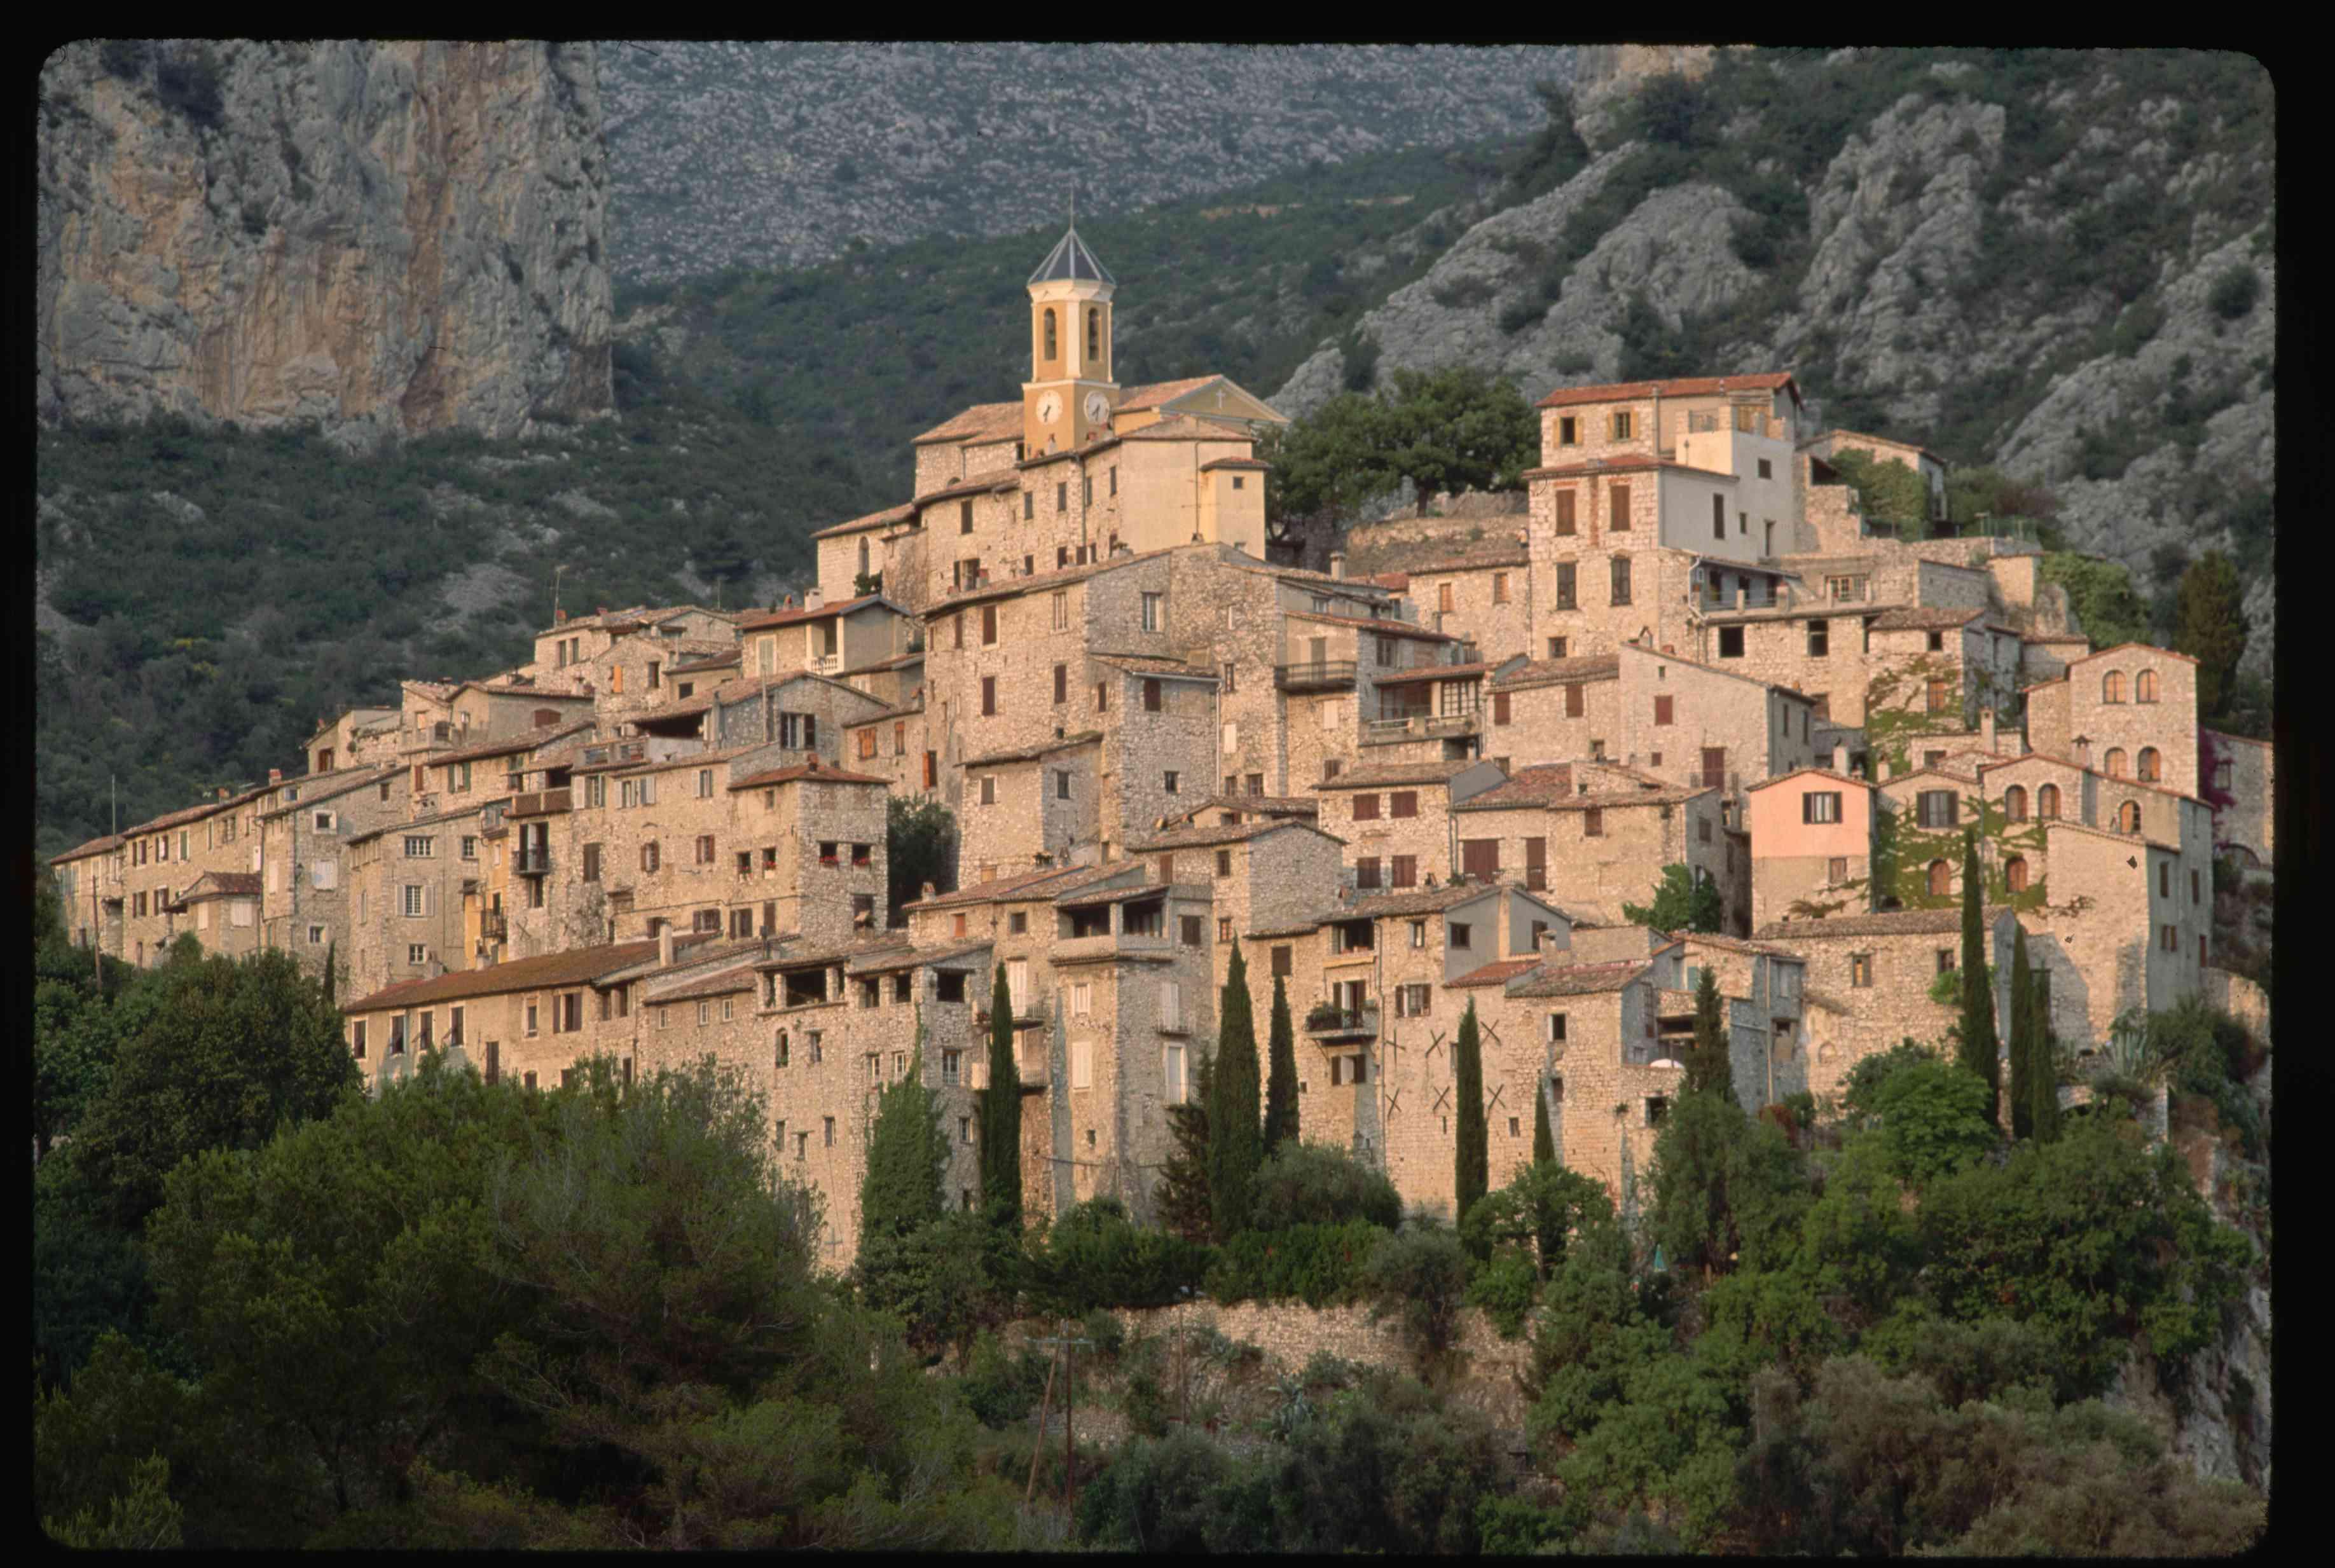 Peillon, a village in France